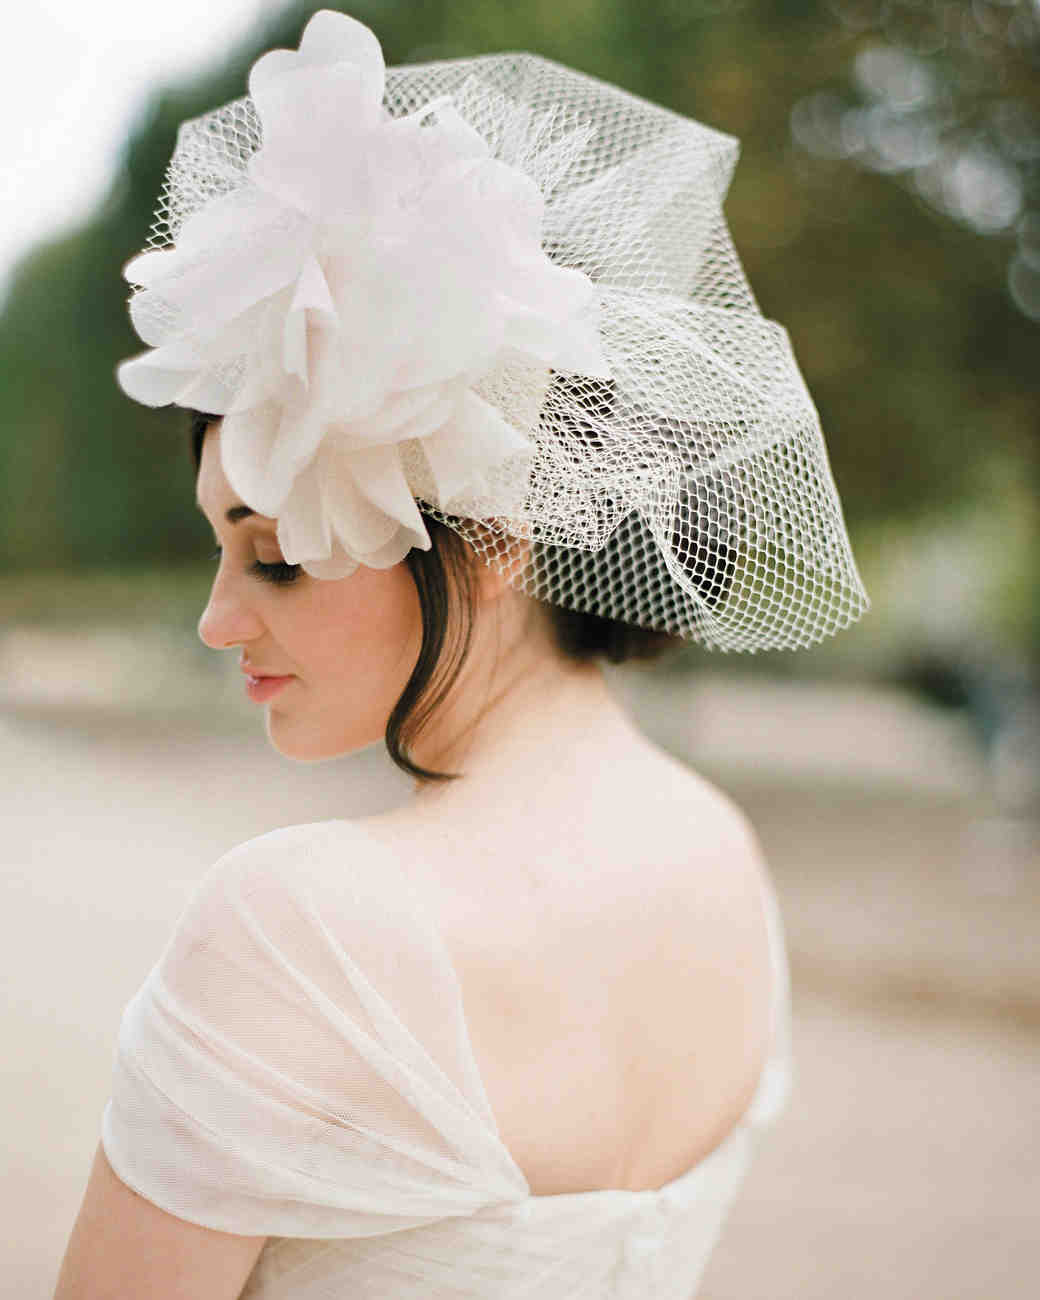 julie-eric-bride-0918-mwds109913.jpg